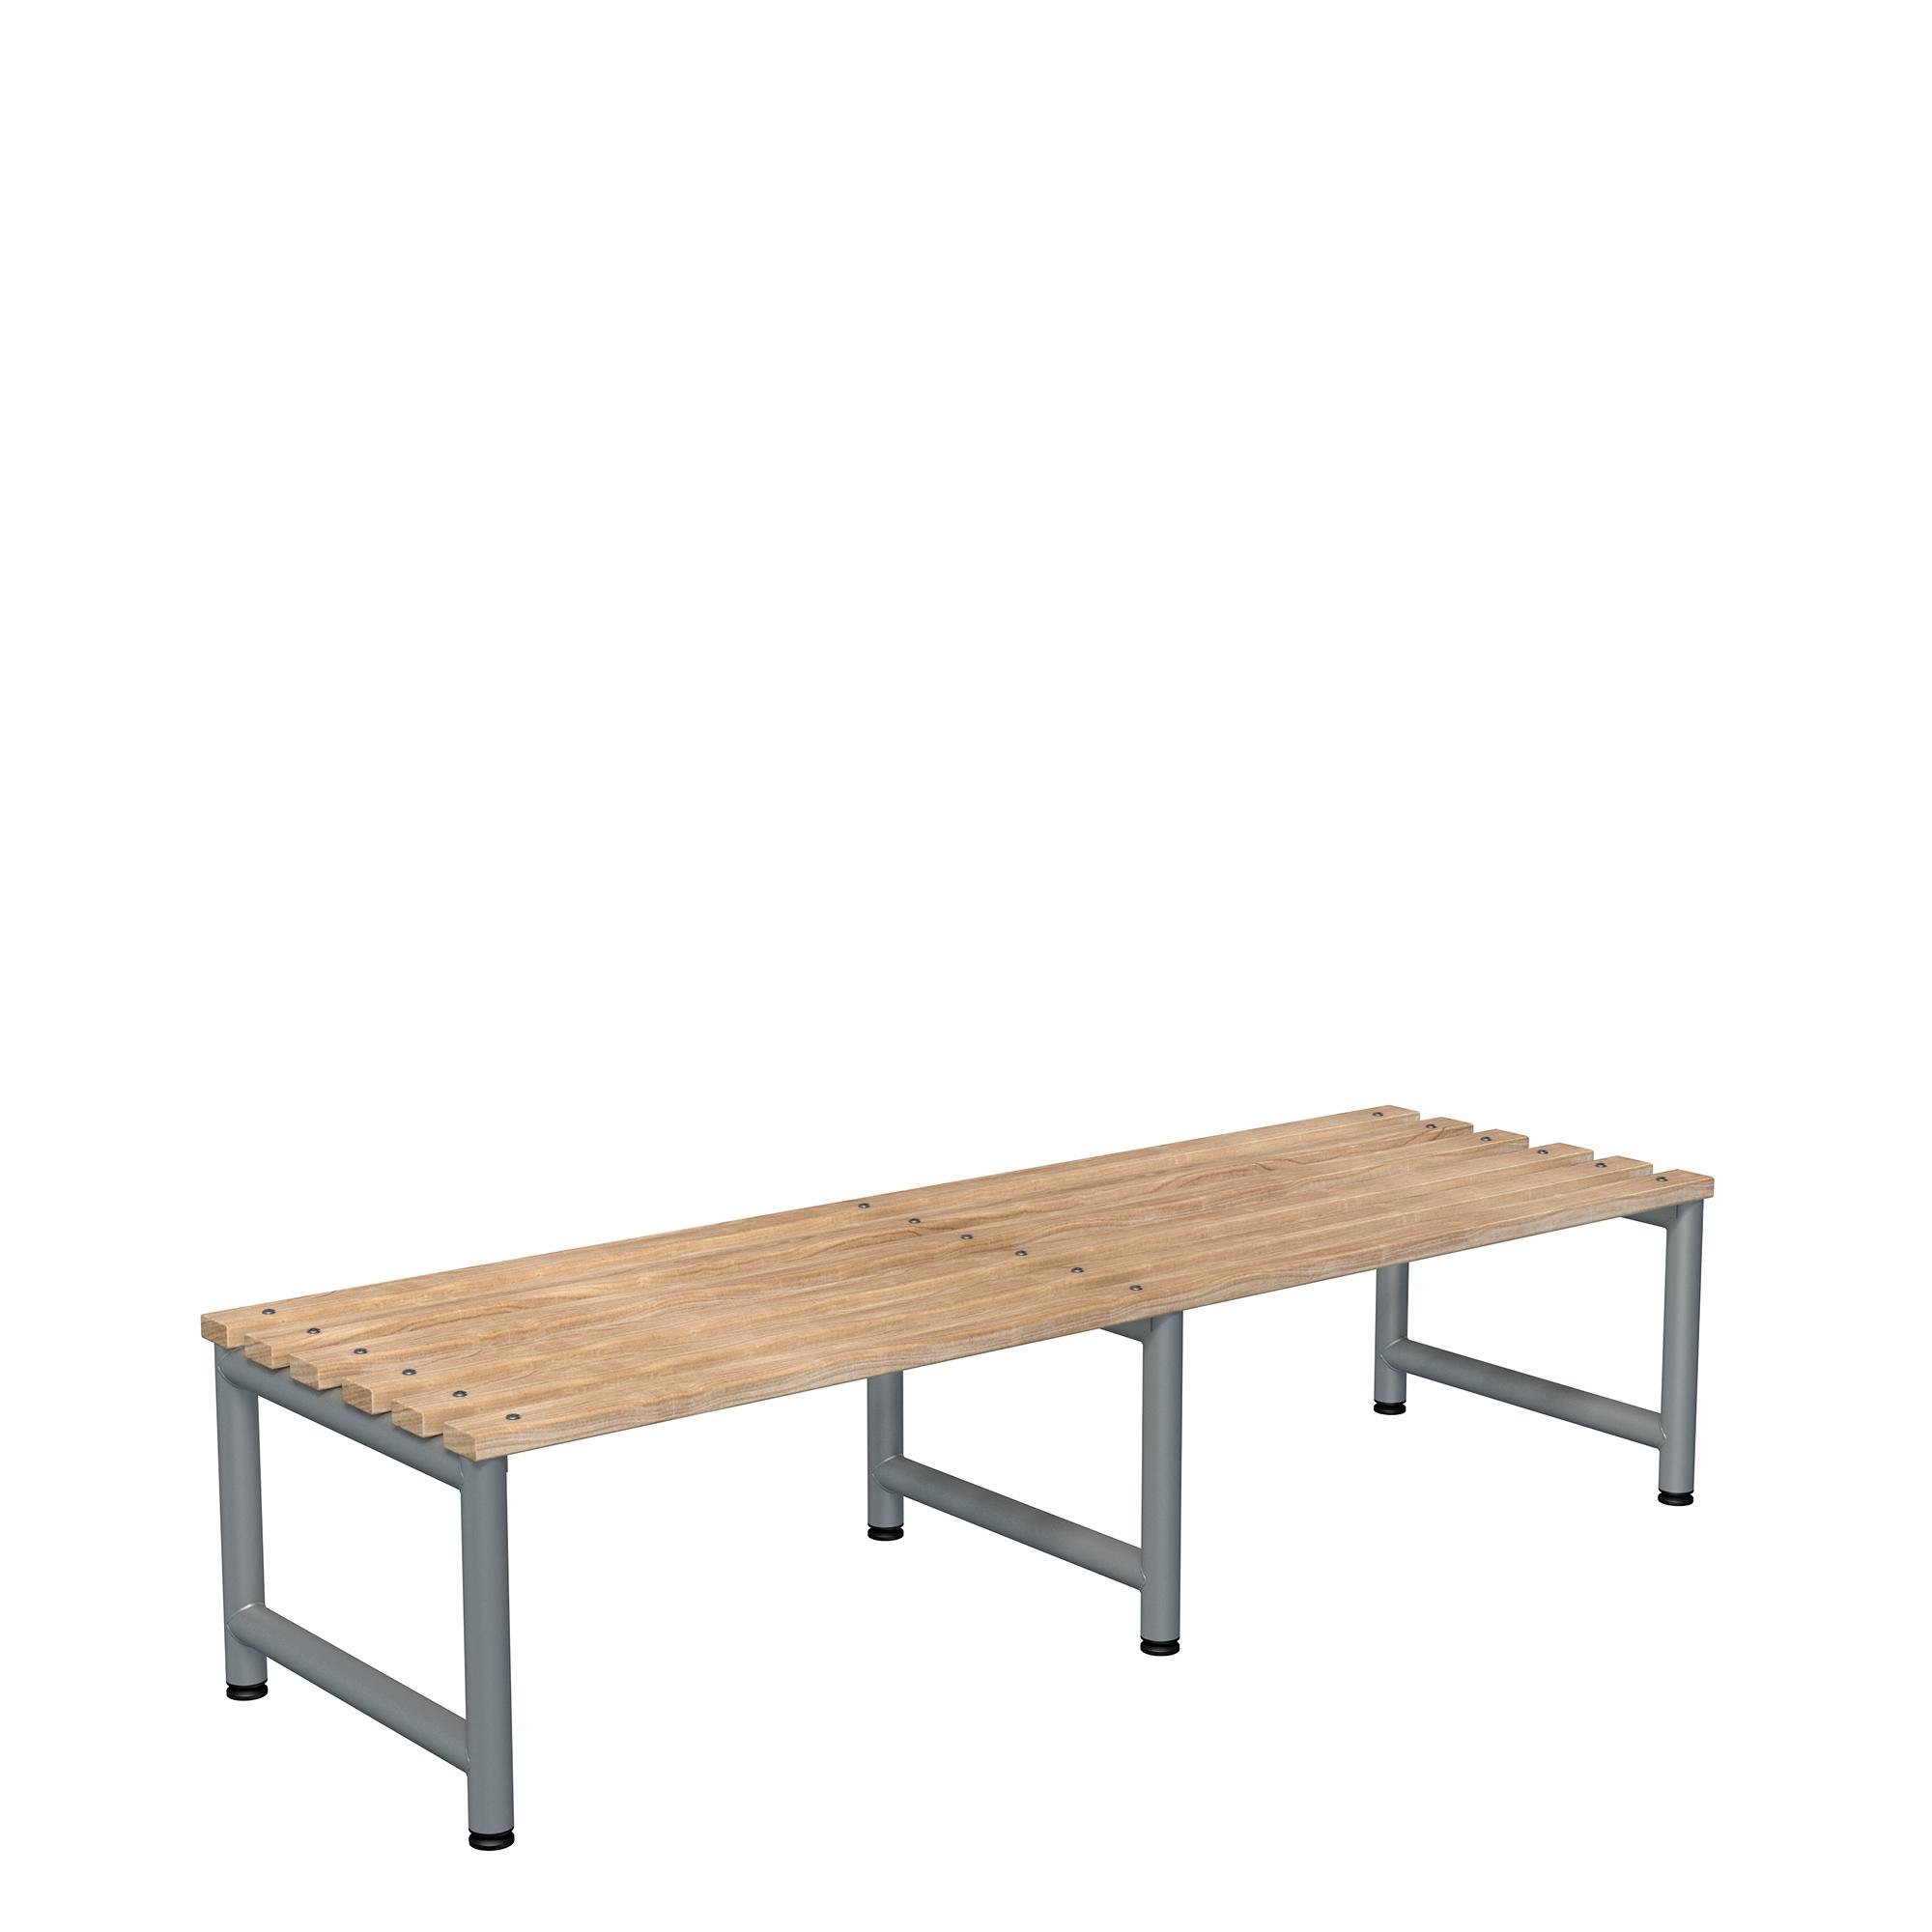 Single Sided Senior Bench 1000x305